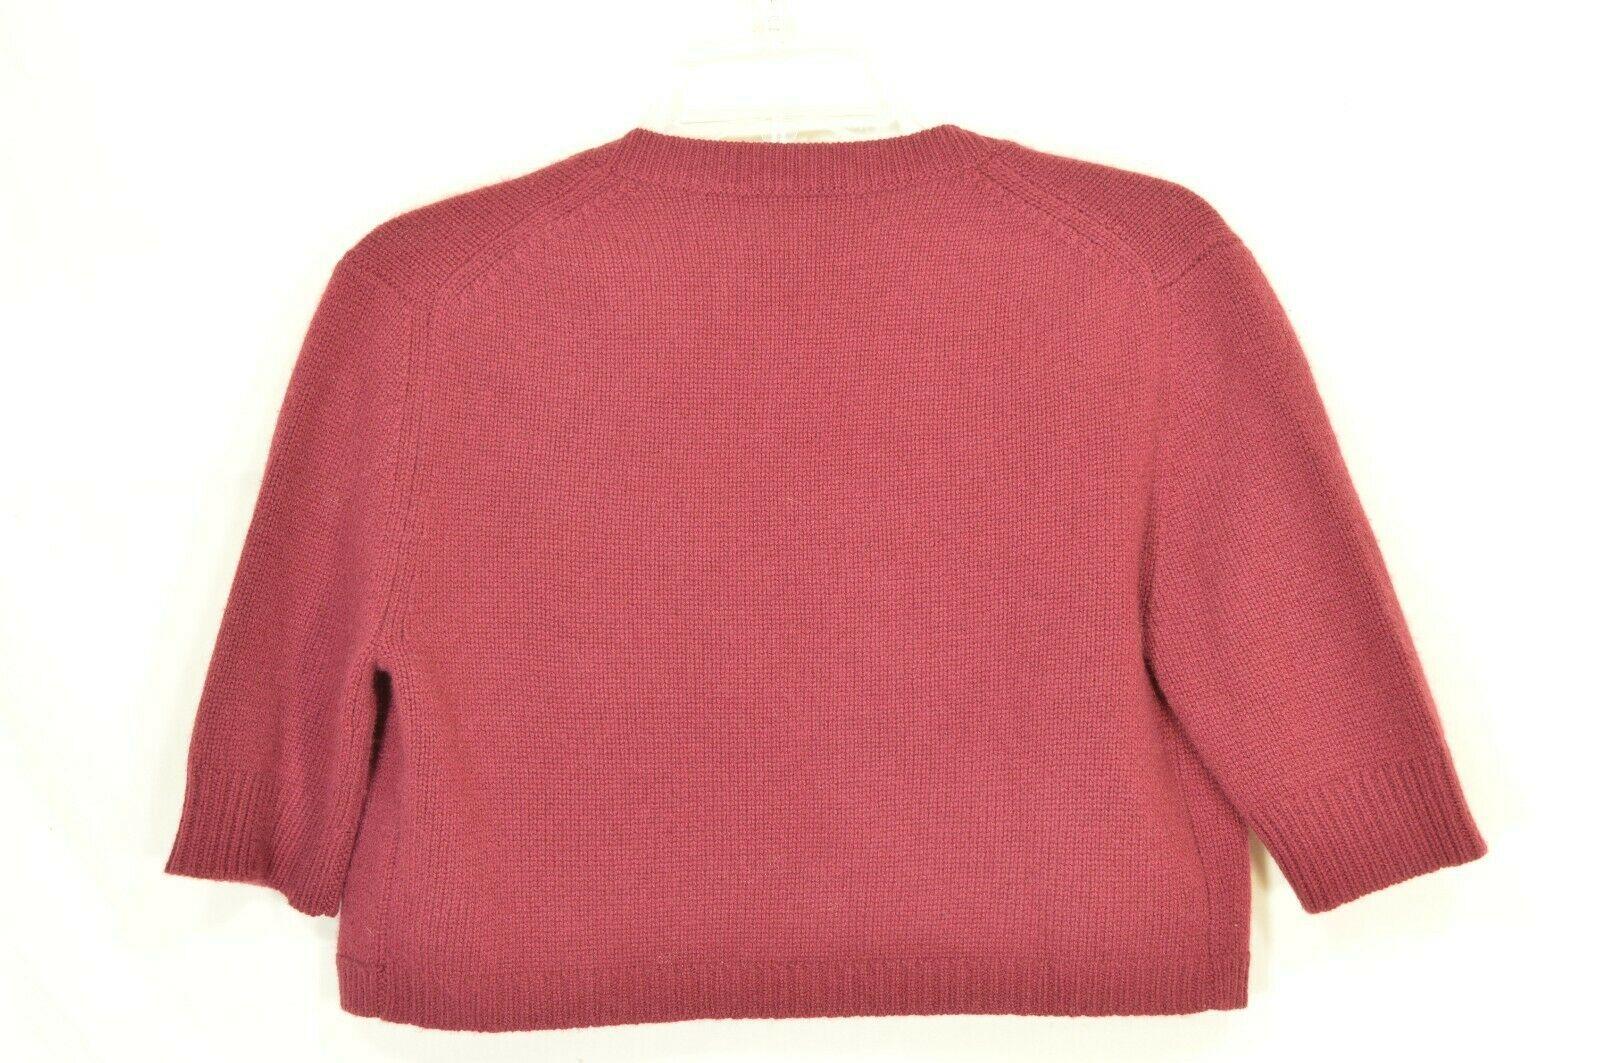 Neiman Marcus sweater M NWT red 100% cashmere shrug bolero cropped $195 new image 8